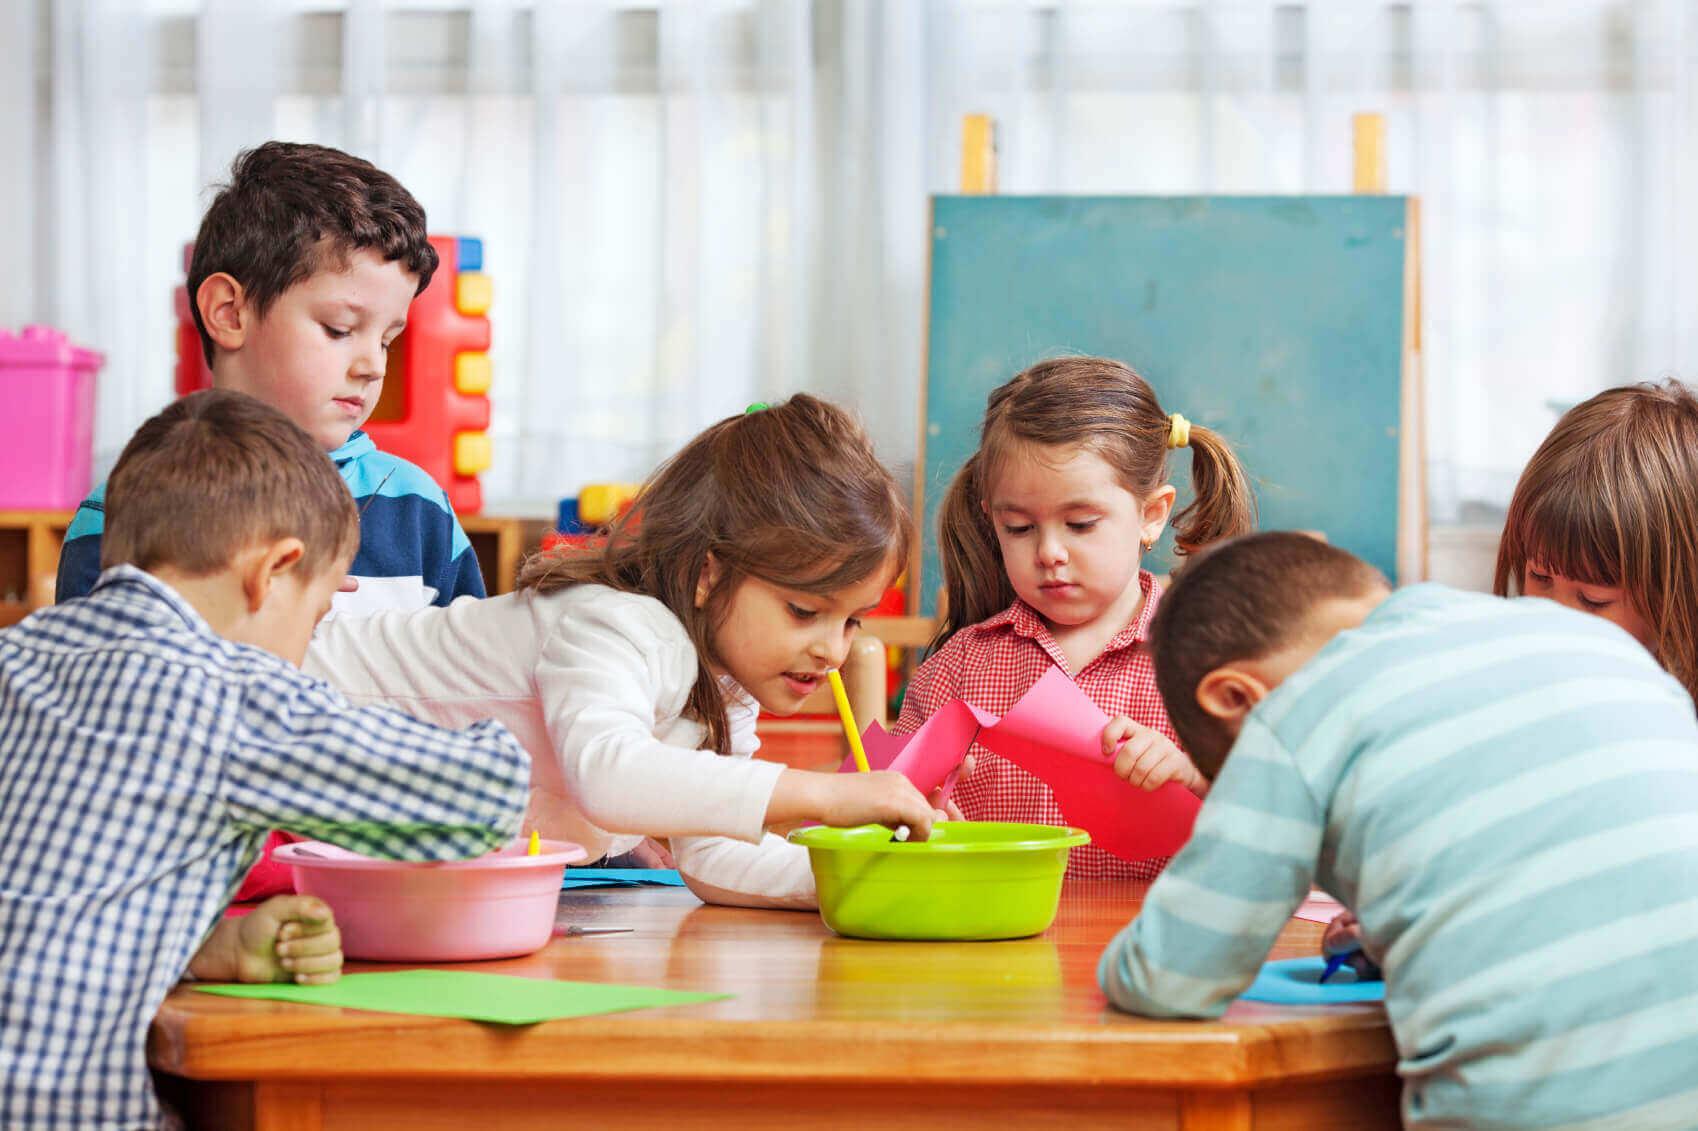 Sint-Pieters-Woluwe sluit Nederlandstalige gemeenteschool